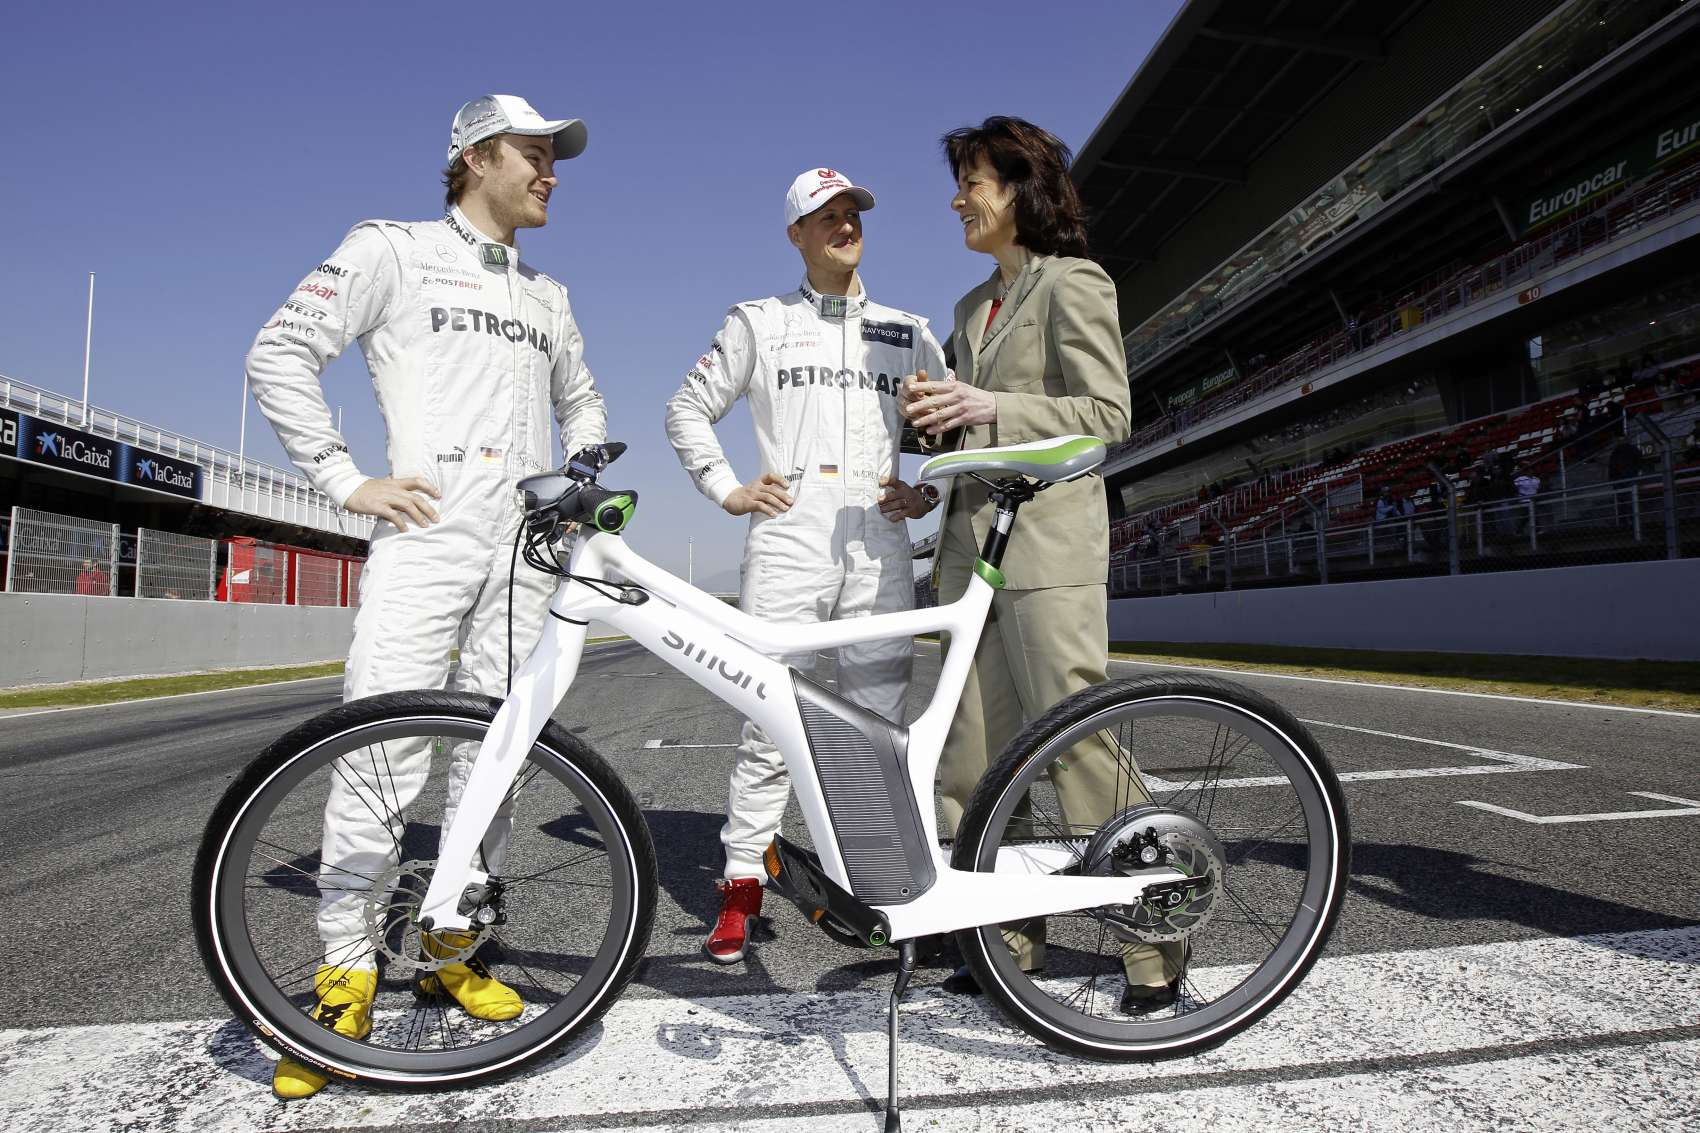 Annette Winkler, Nico Rosberg, Michael Schumacher, racingline, racingline.hu, racinglinehu